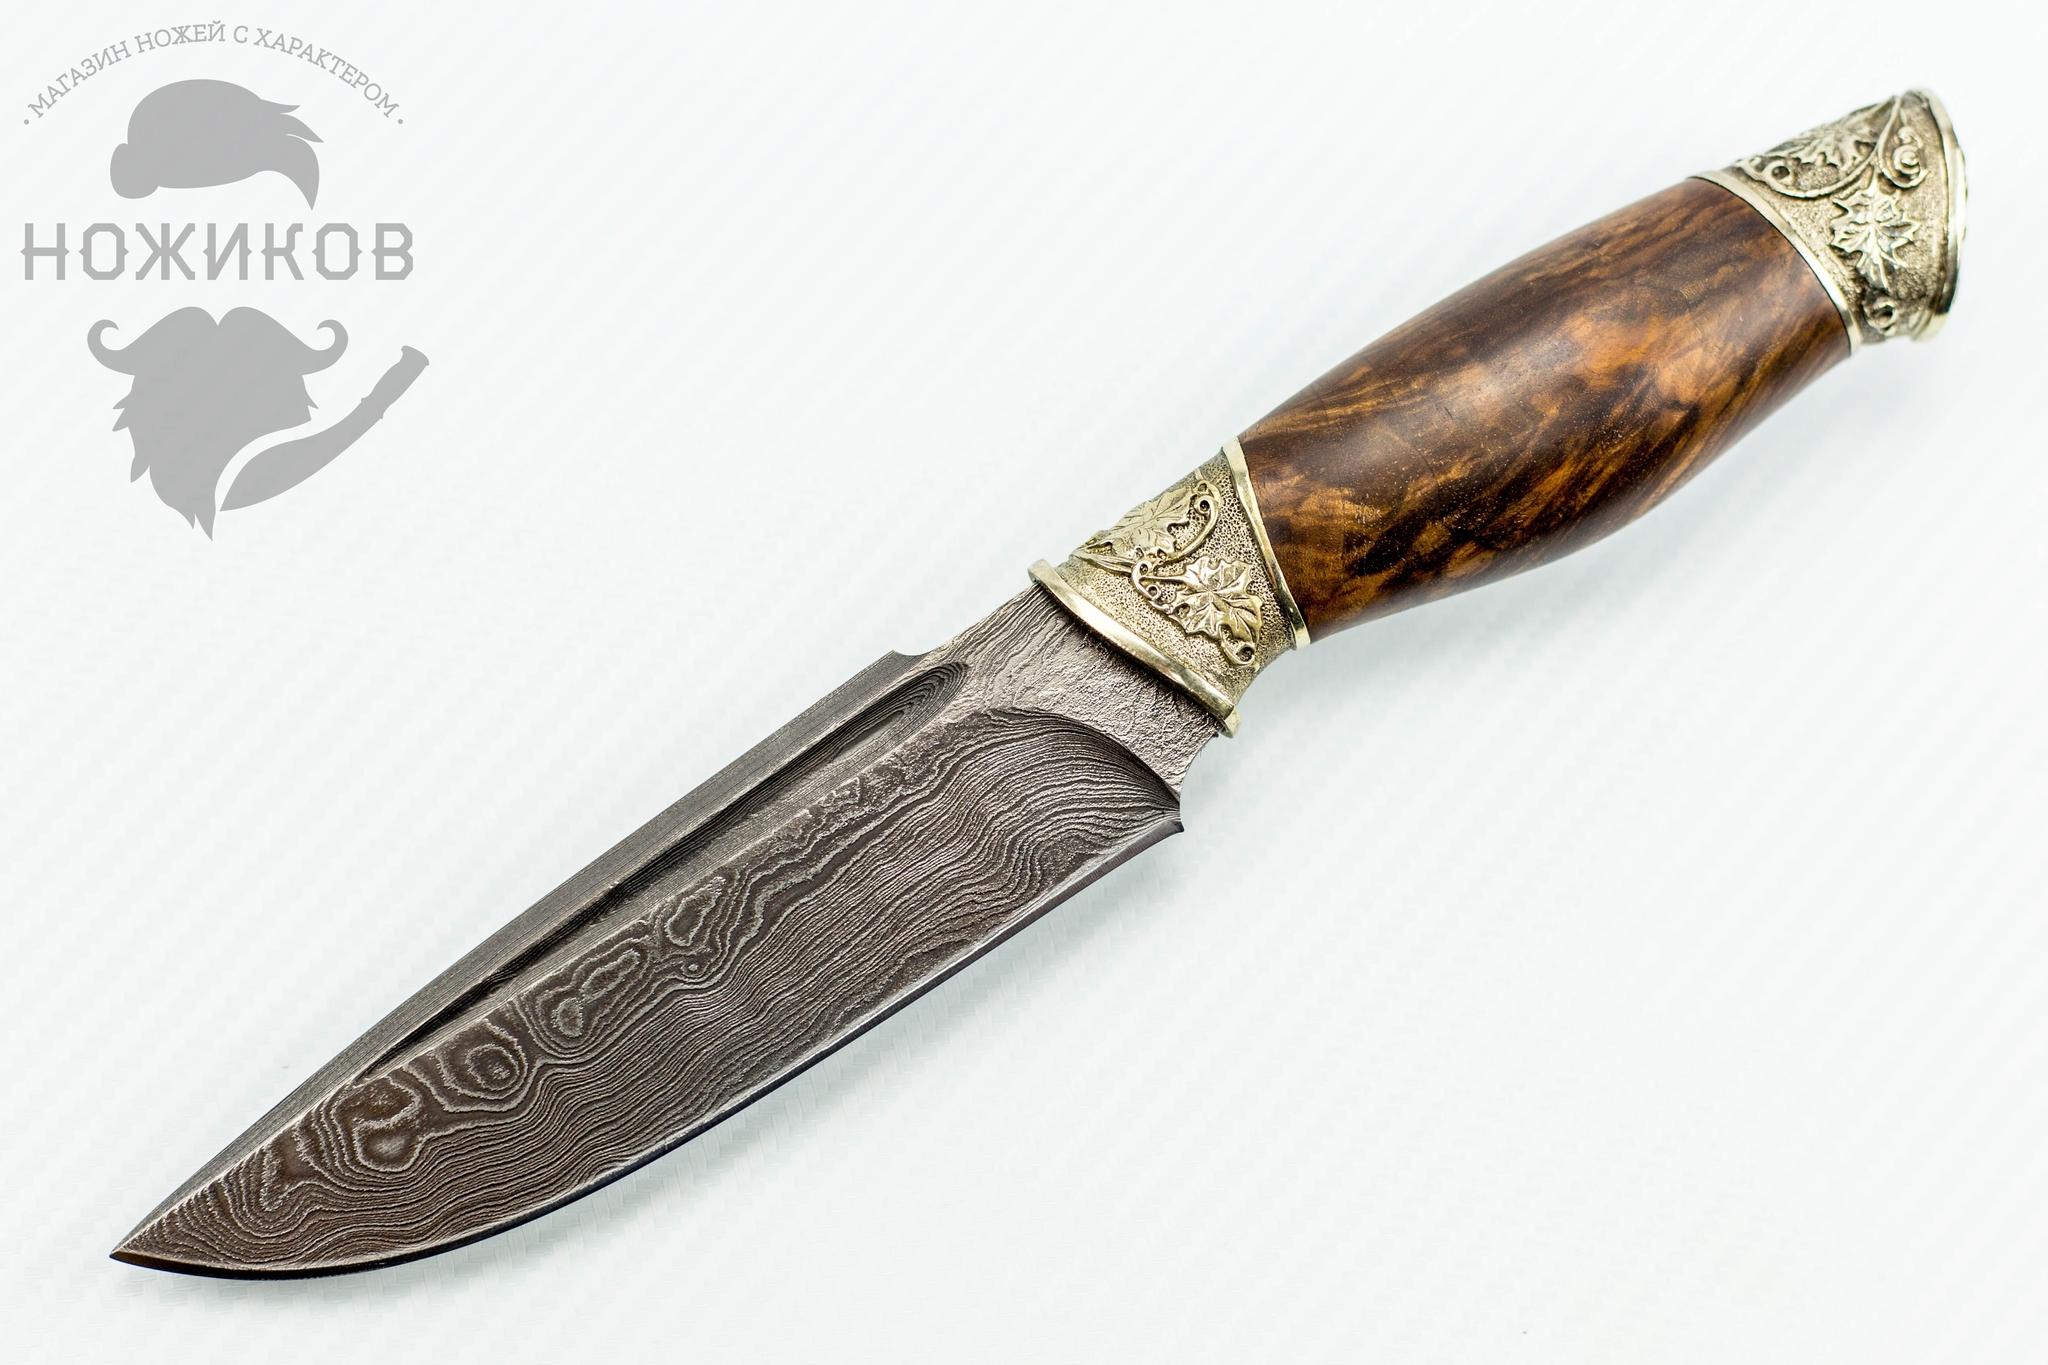 Авторский Нож из Дамаска №84, КизлярКизляр<br><br>